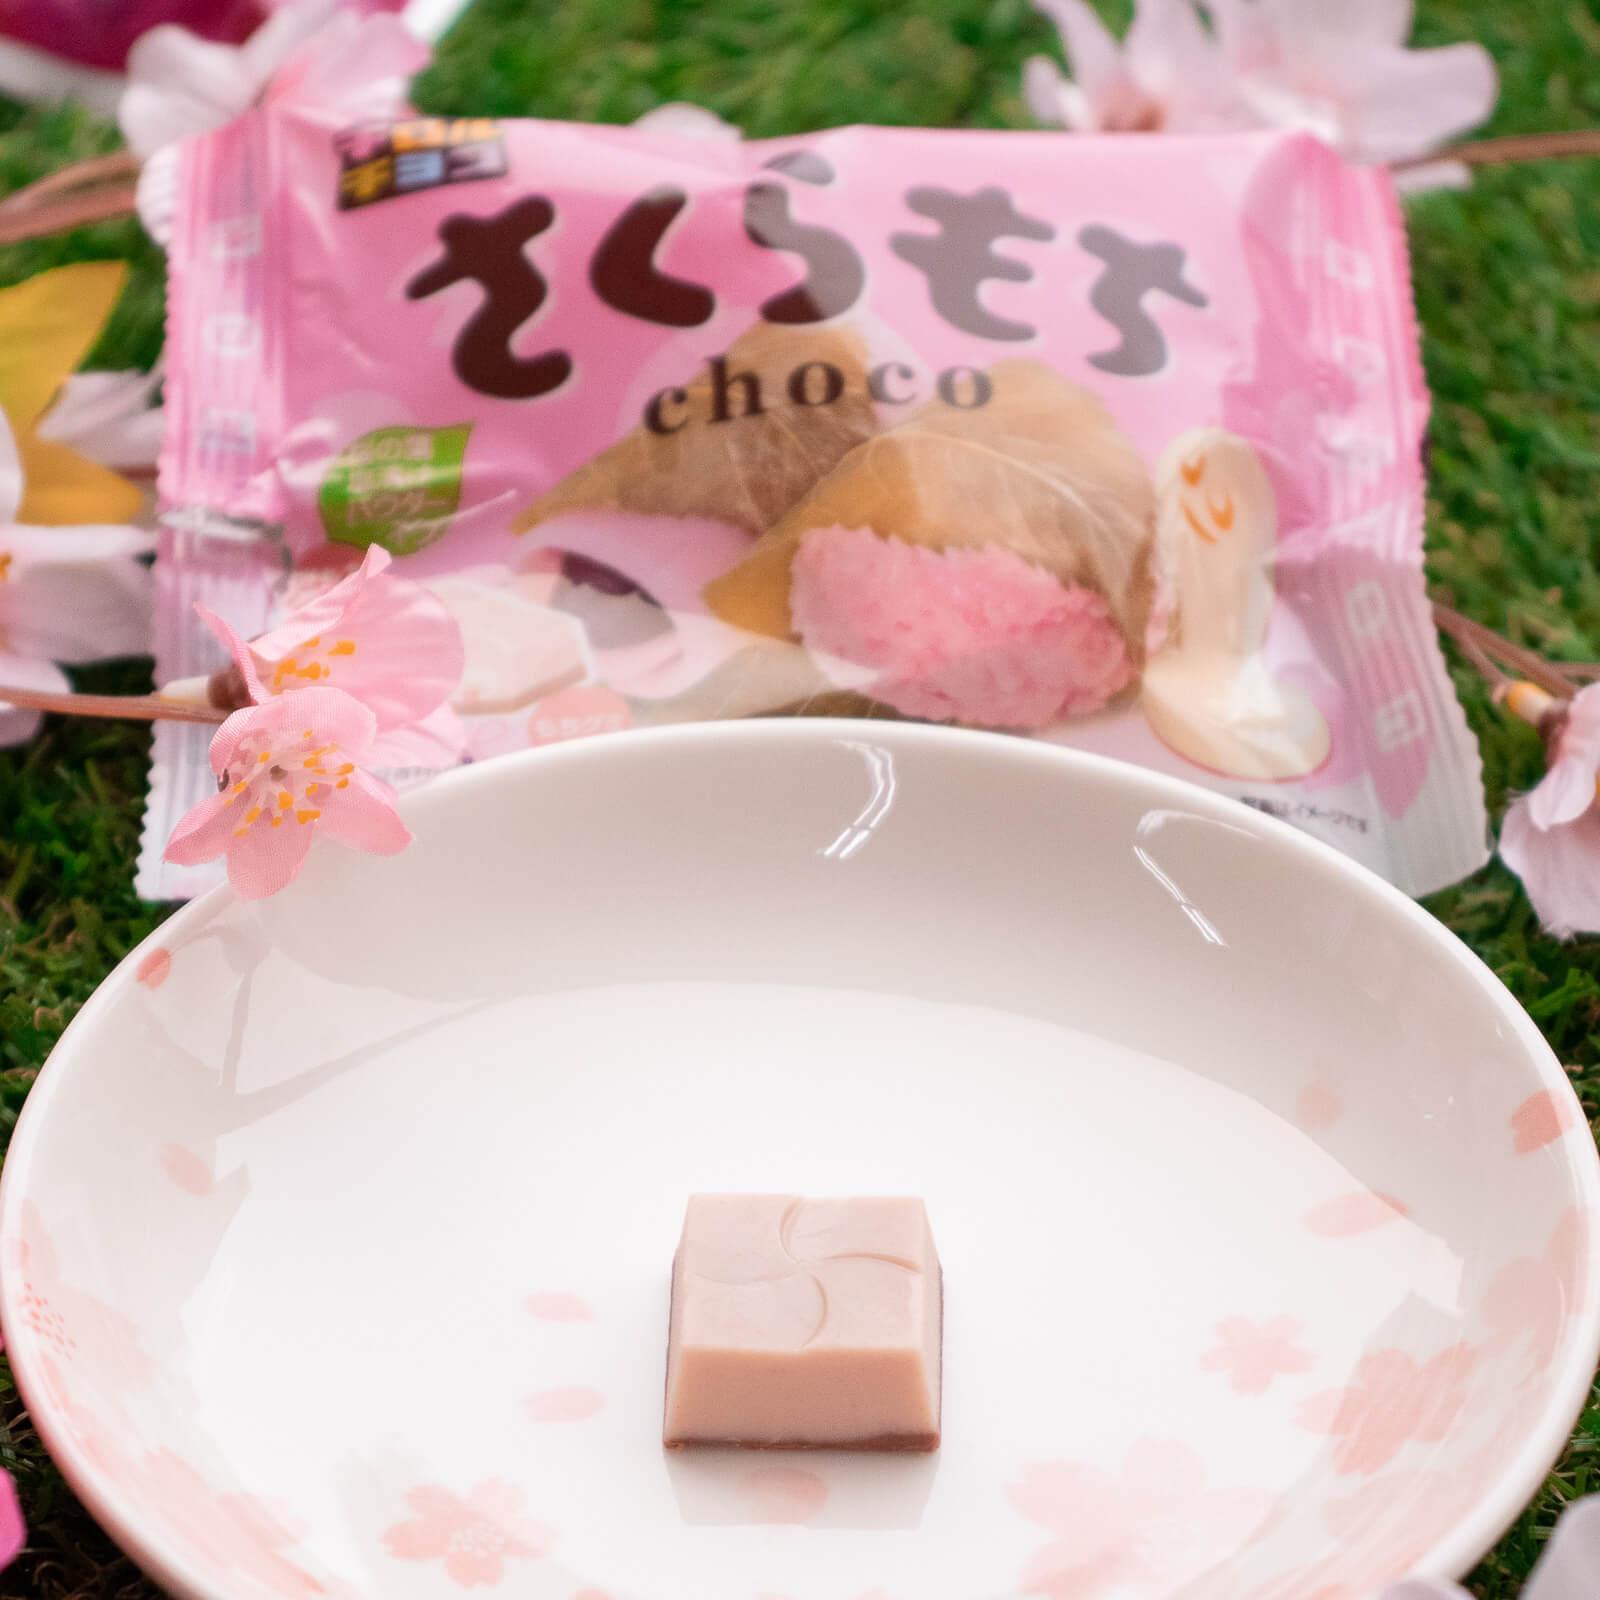 Tirol's Sakuramochi Choco (included in Hanami Party Sweets Pack)